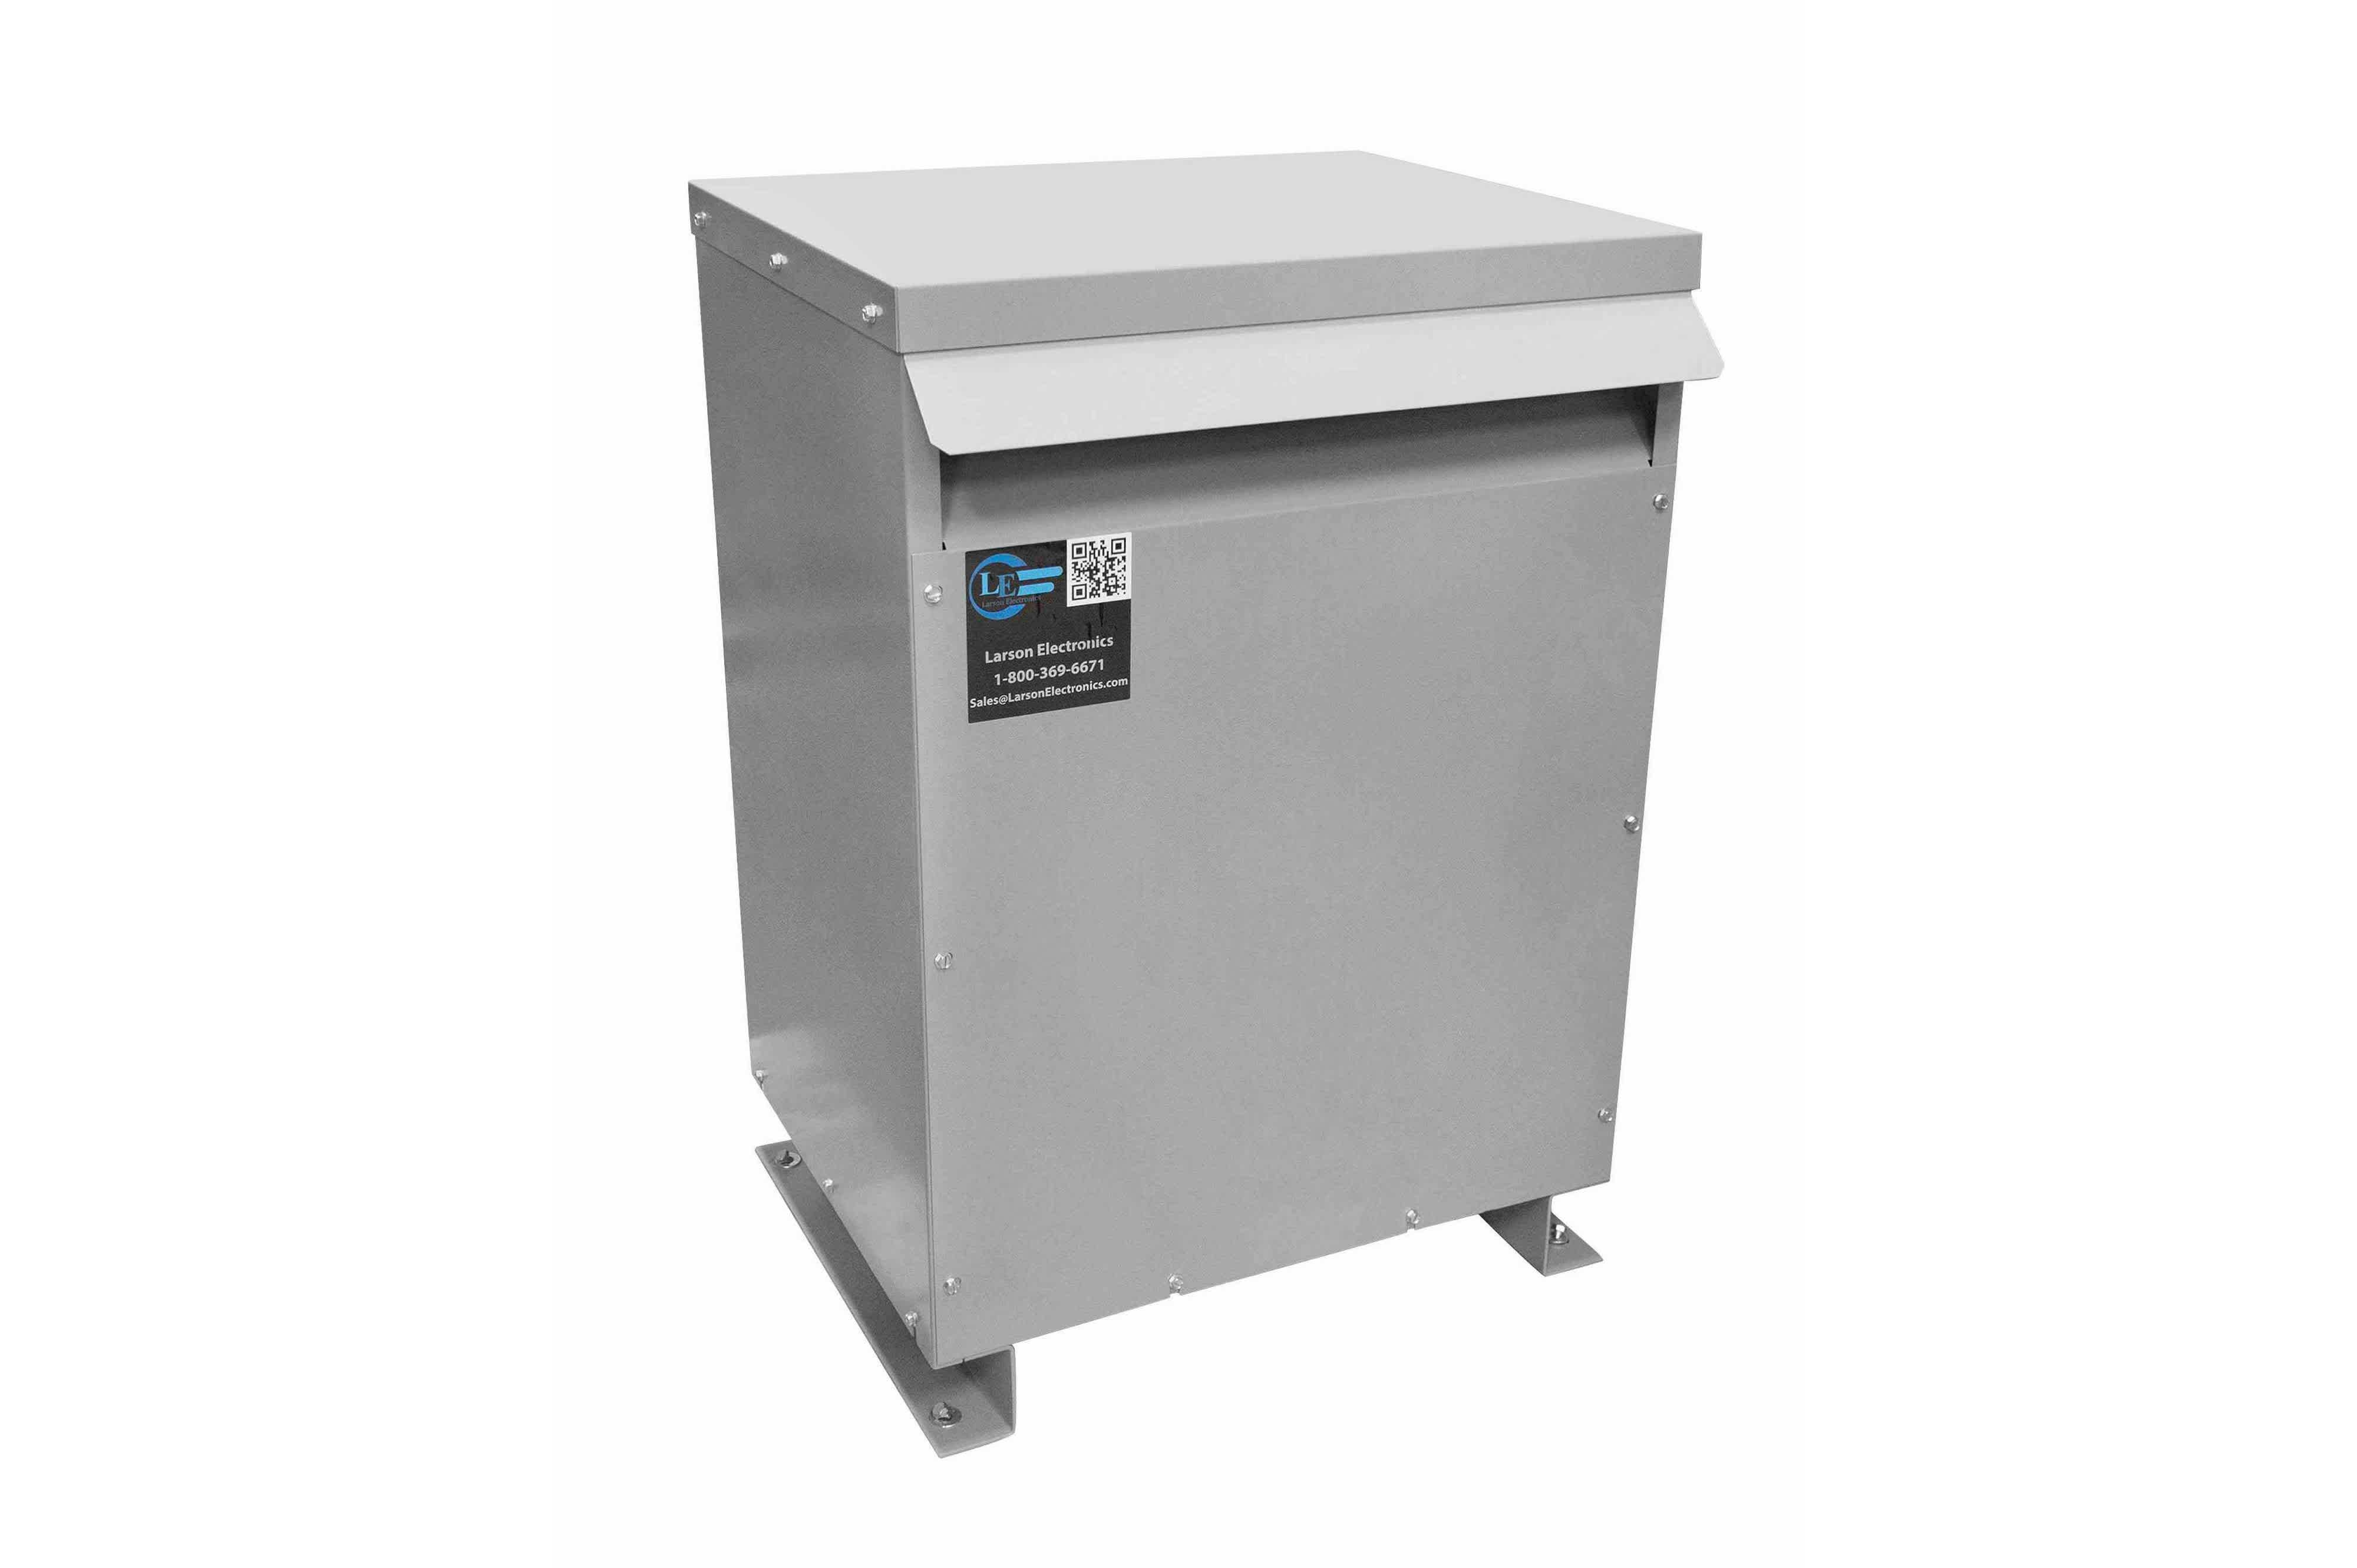 110 kVA 3PH Isolation Transformer, 460V Wye Primary, 400Y/231 Wye-N Secondary, N3R, Ventilated, 60 Hz